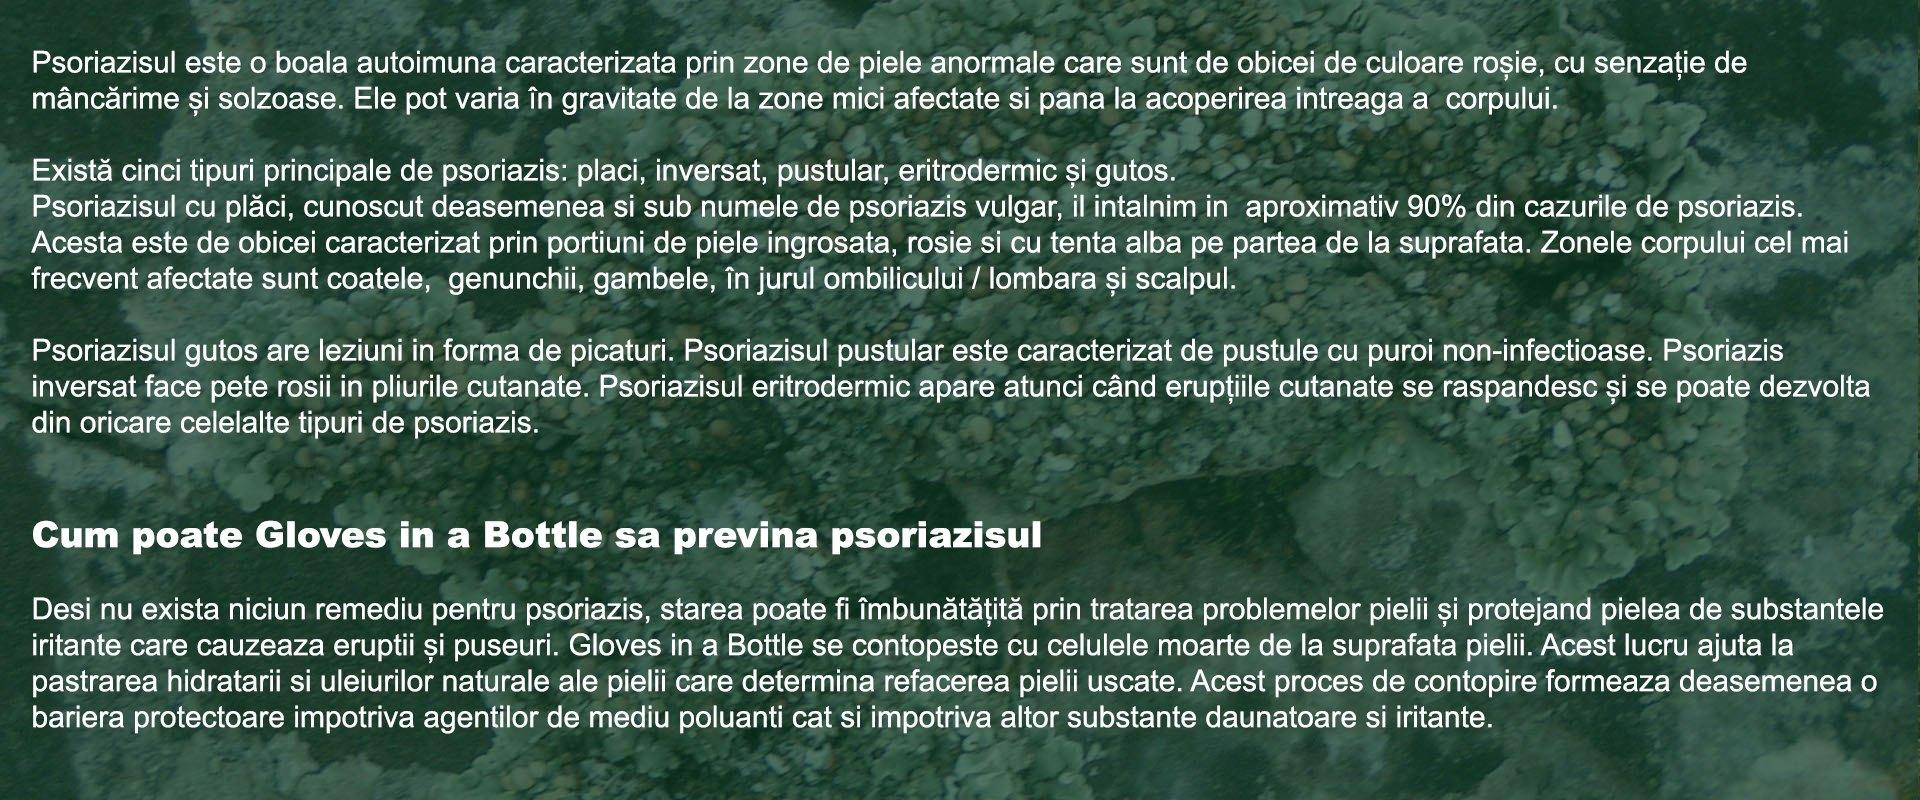 dermatita seboreica tratament natural pt bronsita